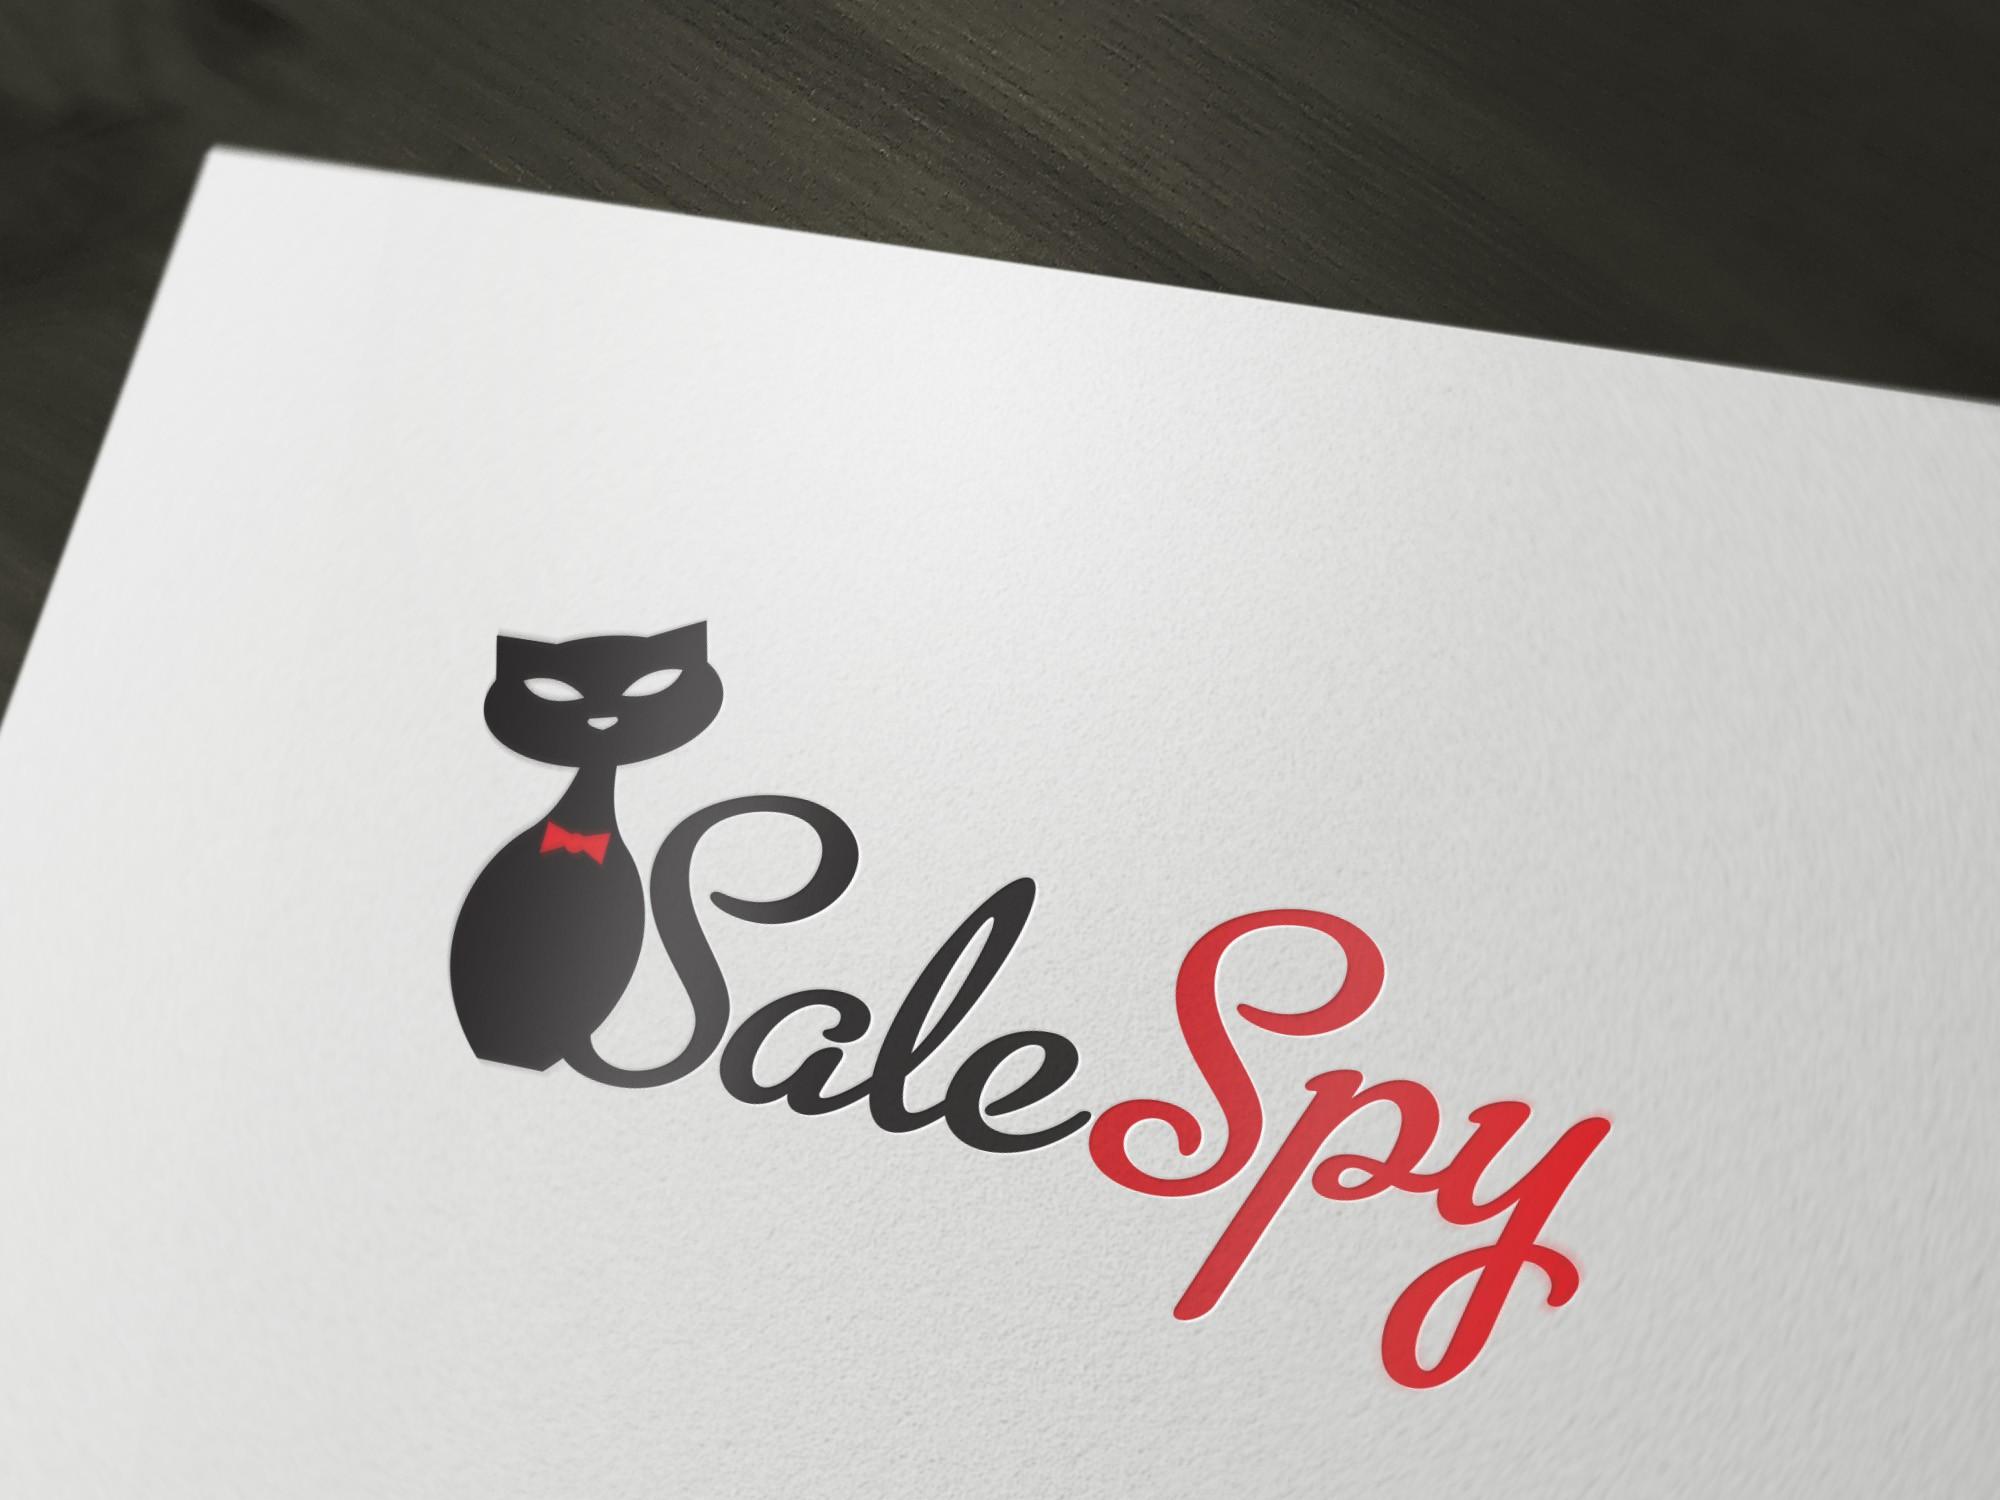 Help SaleSpy with a new logo